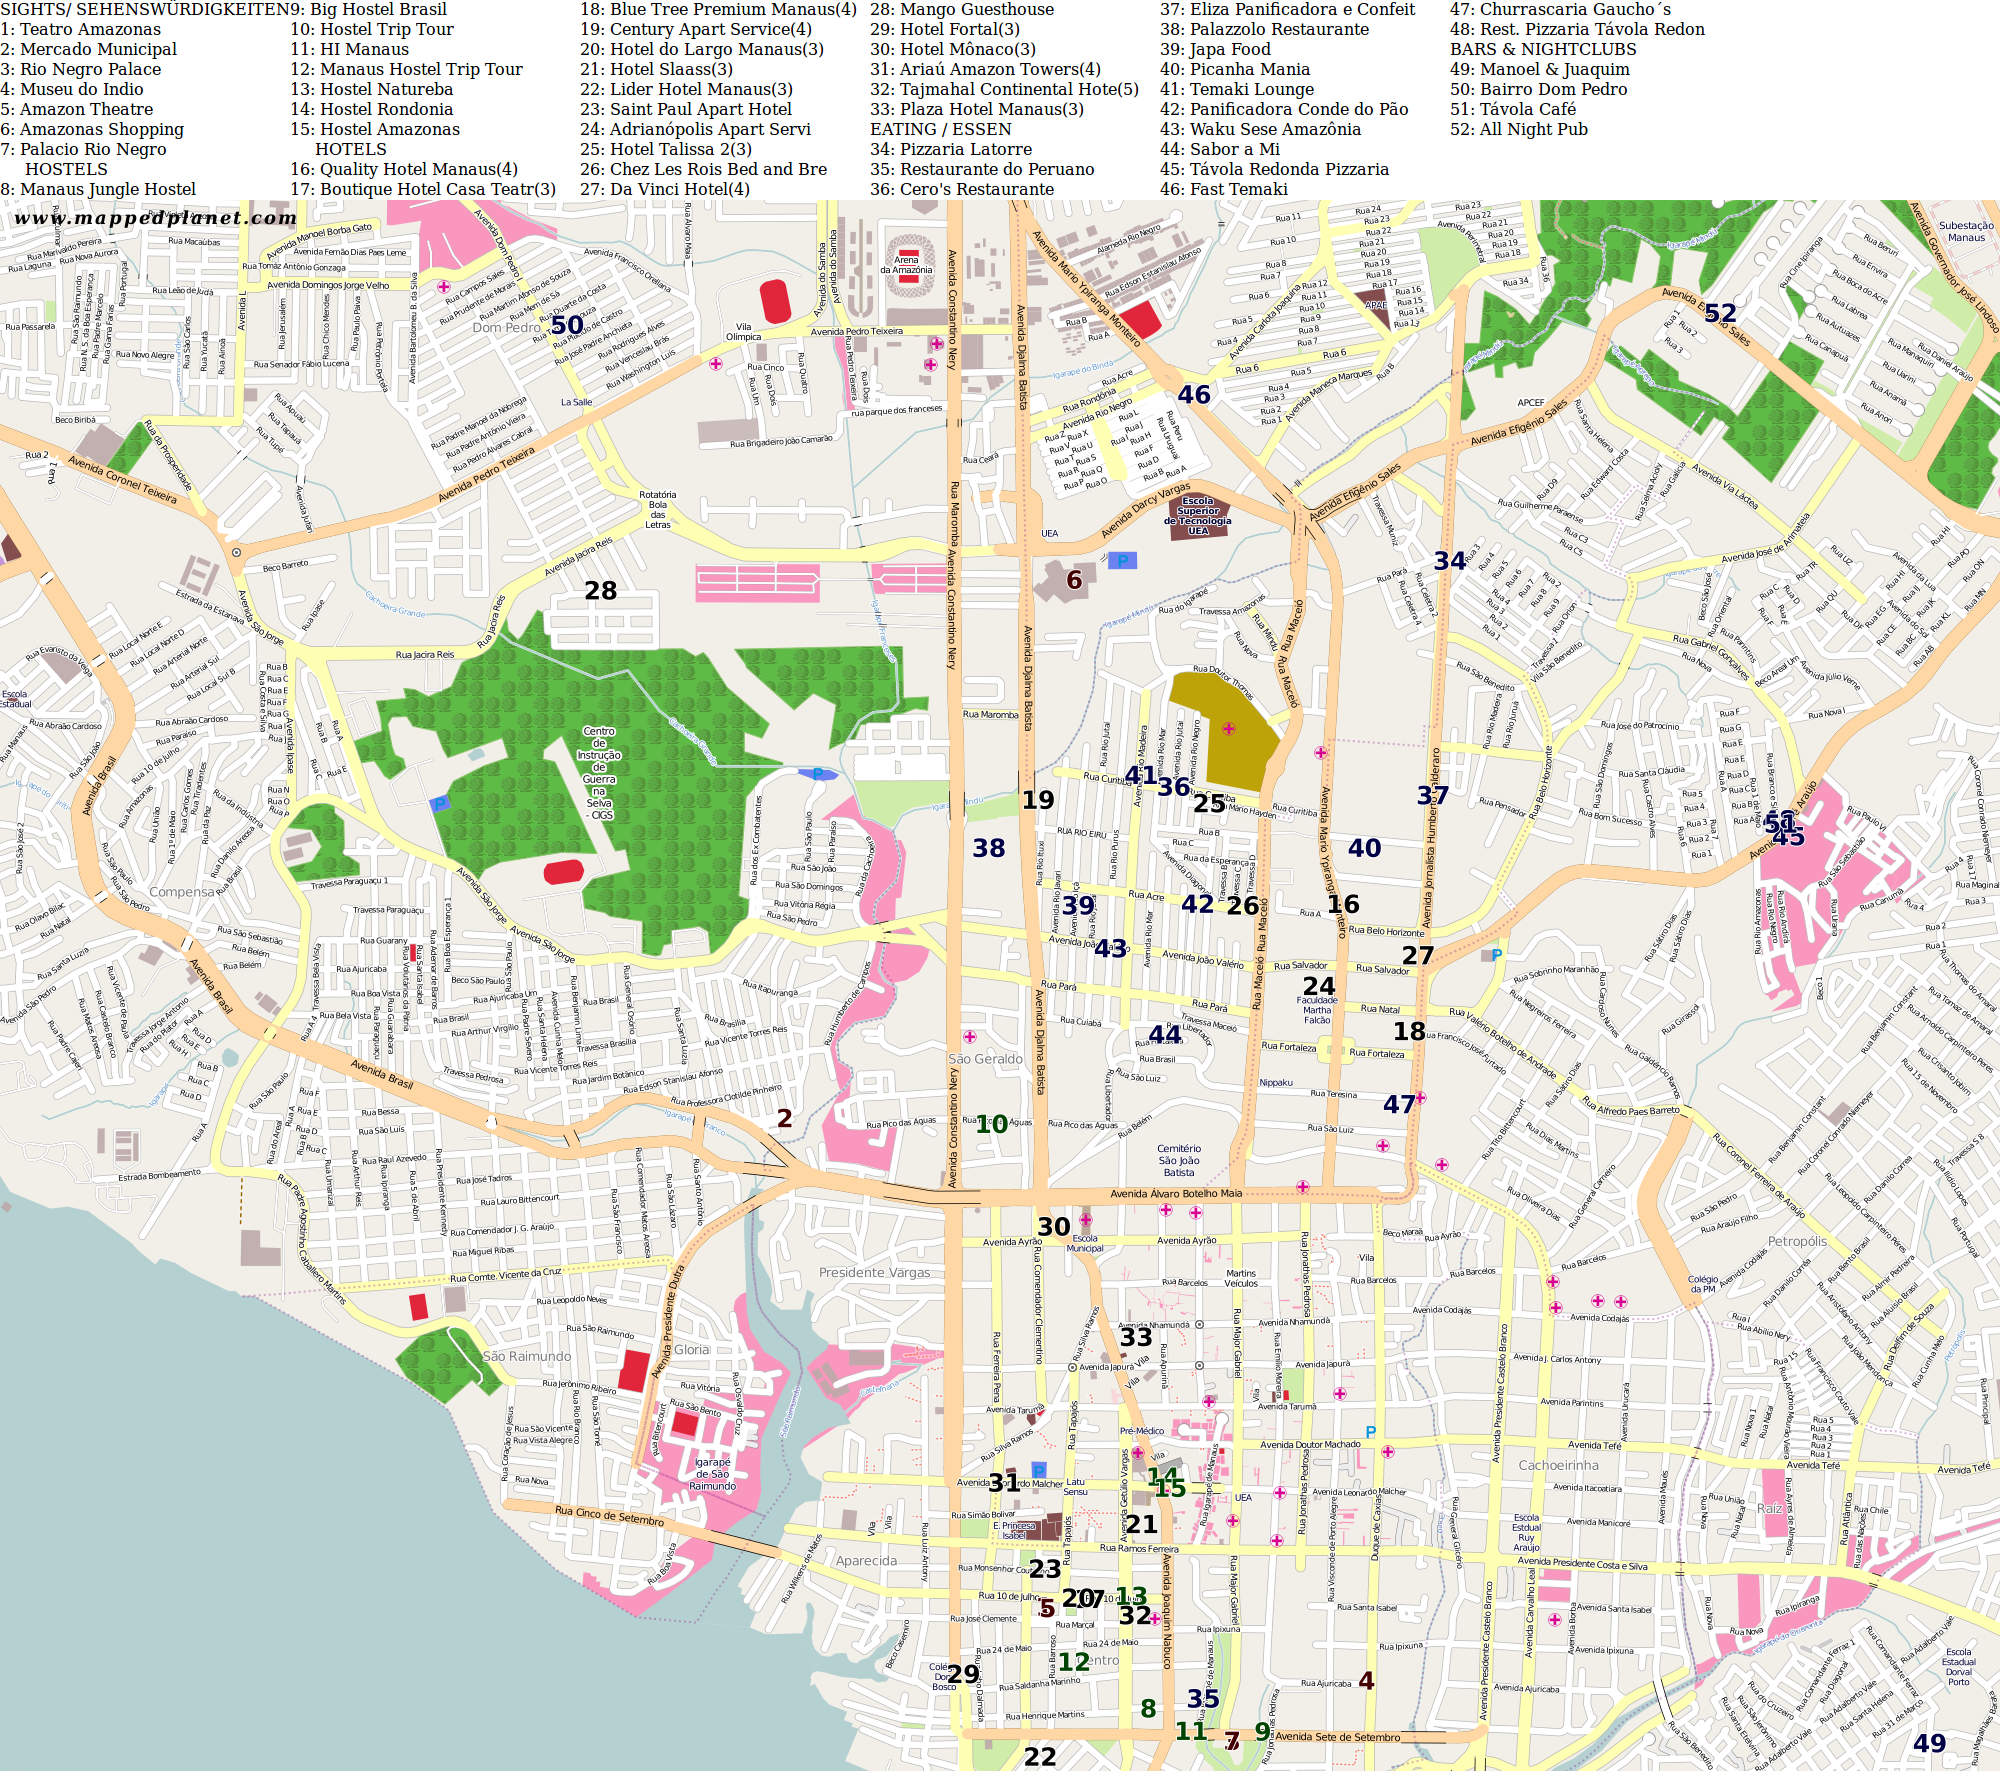 City maps Manaus